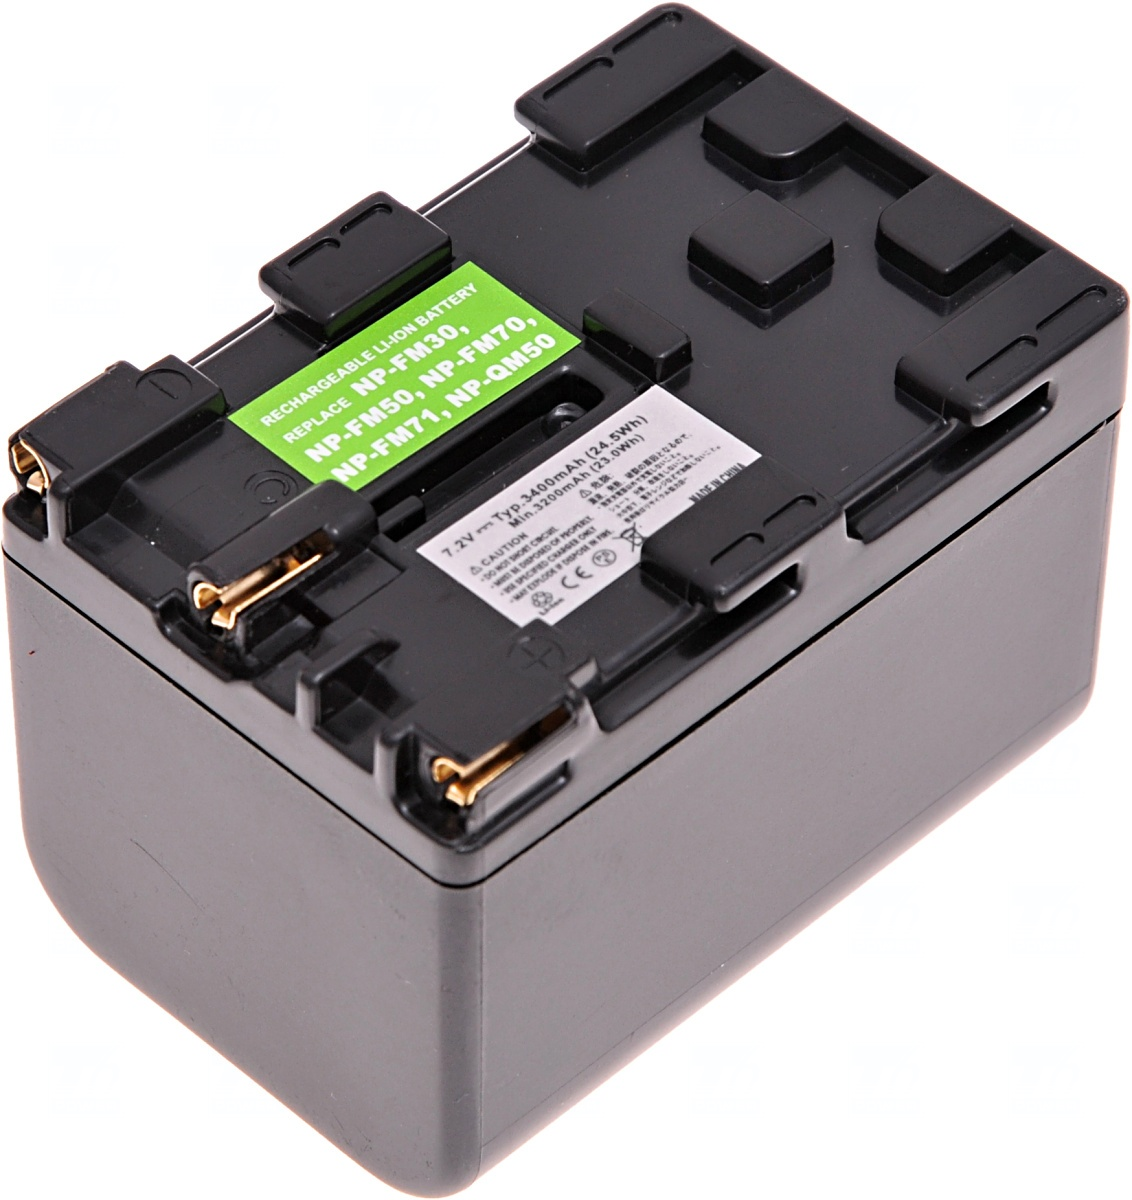 Baterie T6 power Sony NP-FM70, NP-FM71, NP-QM70, NP-QM71, 3400mAh, šedá (Baterie a gripy)